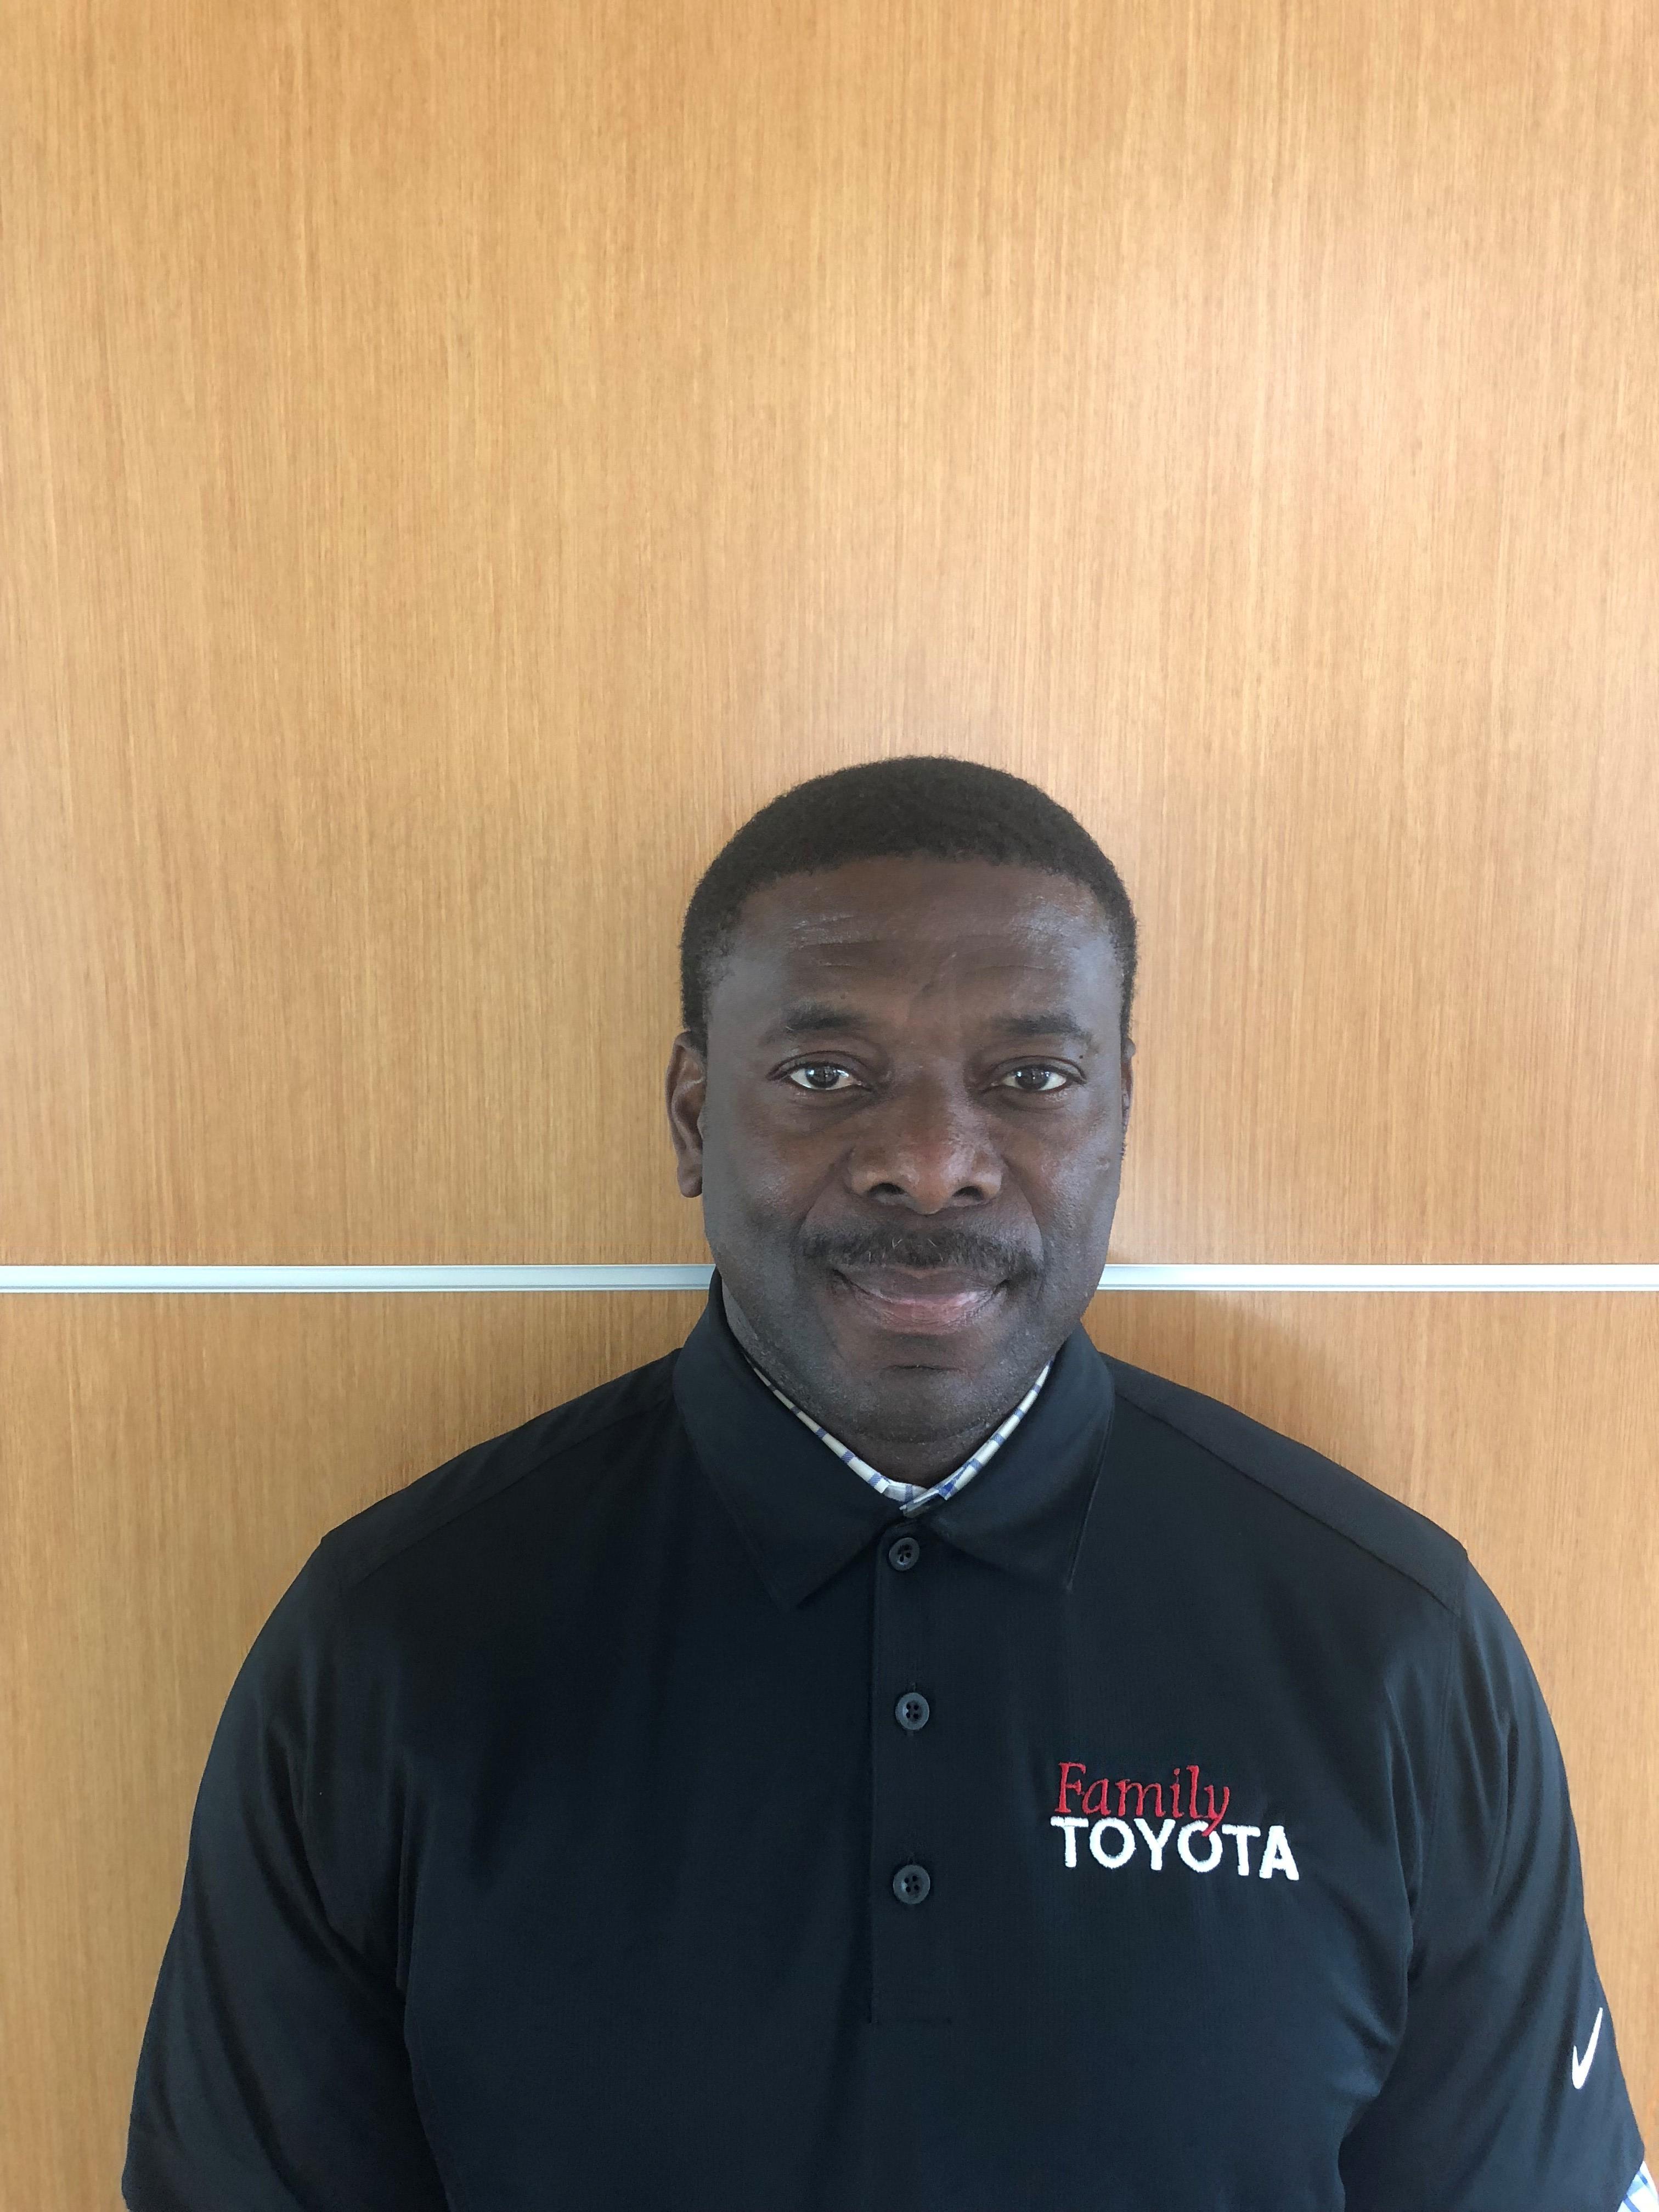 Toyota Arlington Tx New Car Release Information